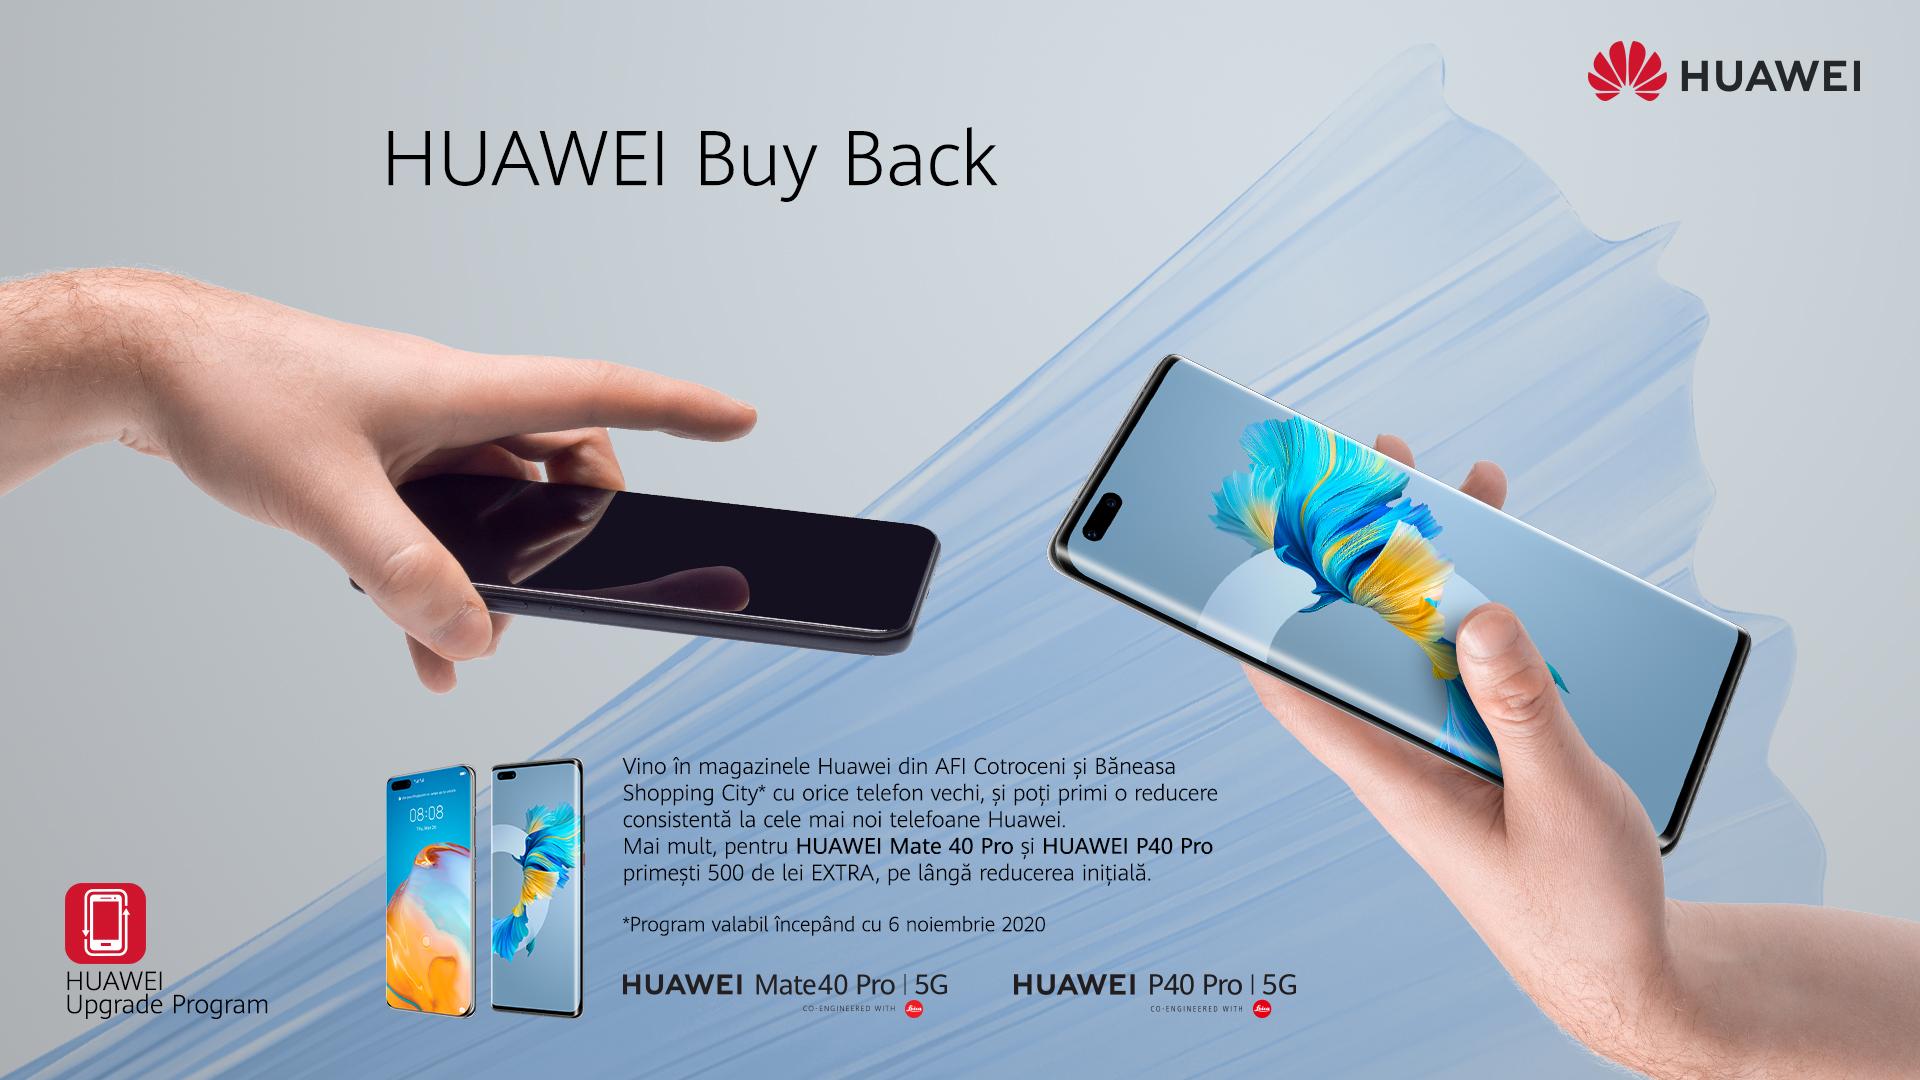 Programul Huawei Buy Back special creat pentru consumatori